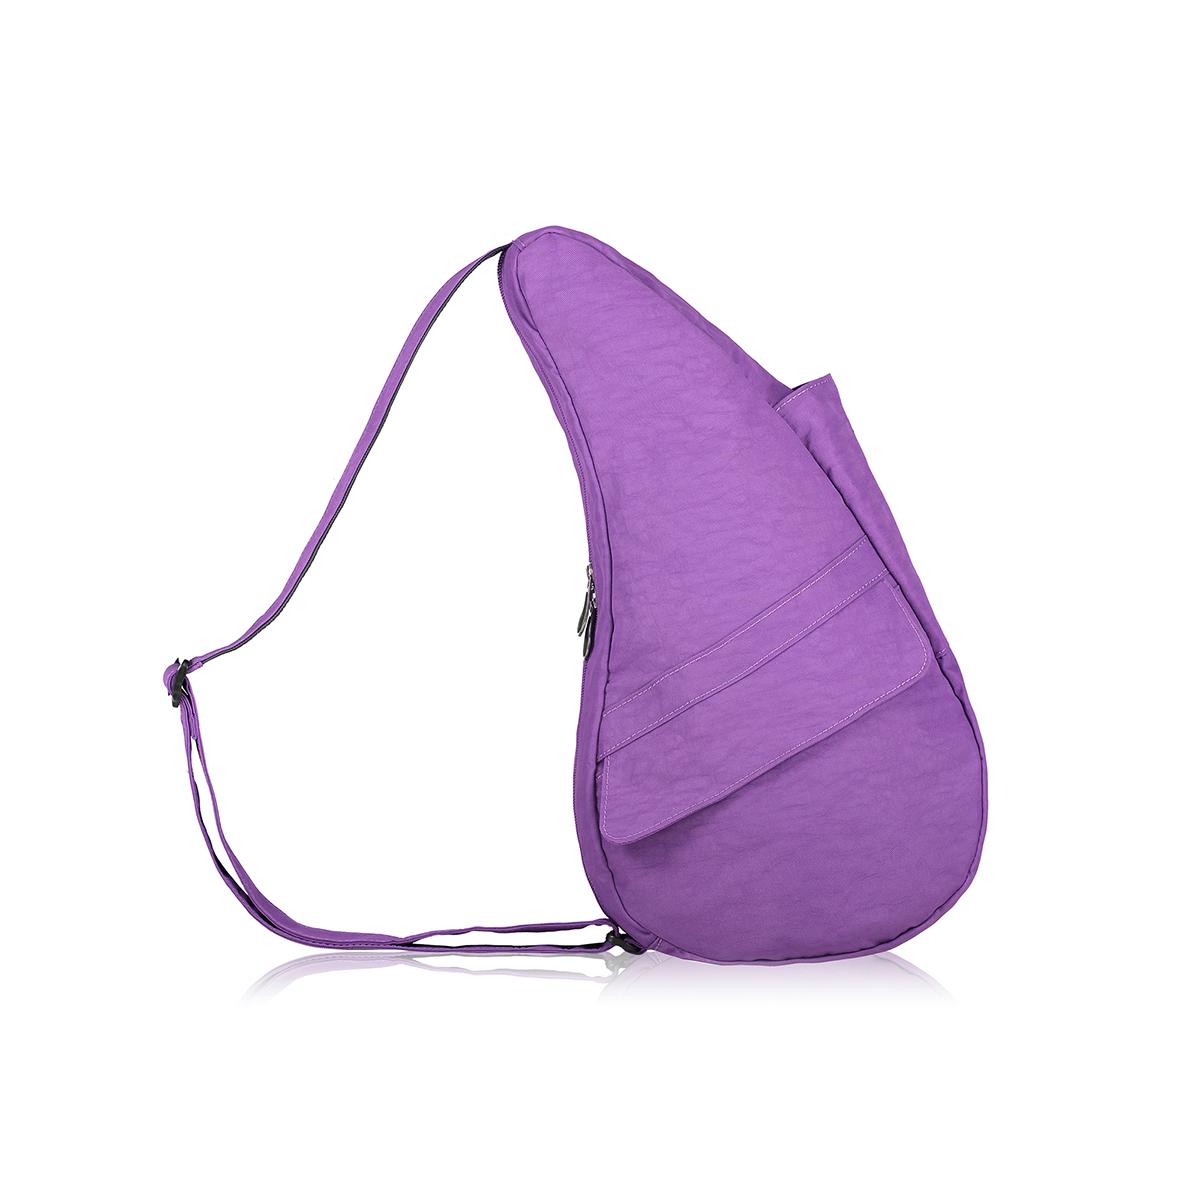 Healthy Back Bag/ヘルシーバックバッグ/ショルダーバッグ/ボディバッグ/旅行バッグ/軽量/レディース/メンズ 《限定ポーチ付》 公式ストア ヘルシーバックバッグ テクスチャードナイロン Sサイズ ウルトラパープル